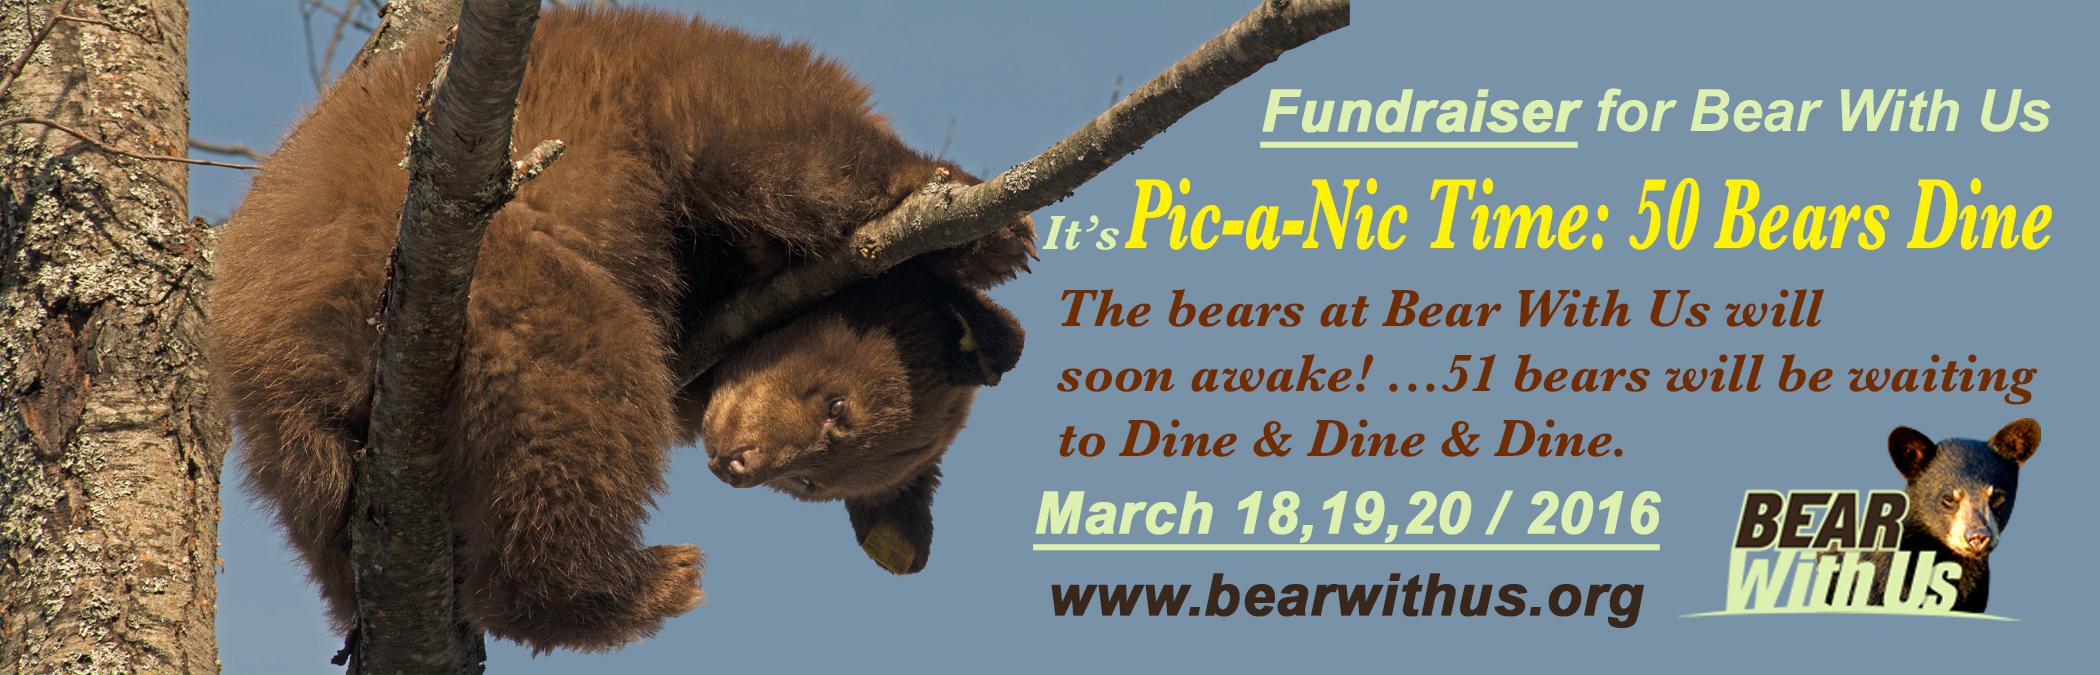 Fundraiser,50Bears-Dine-1